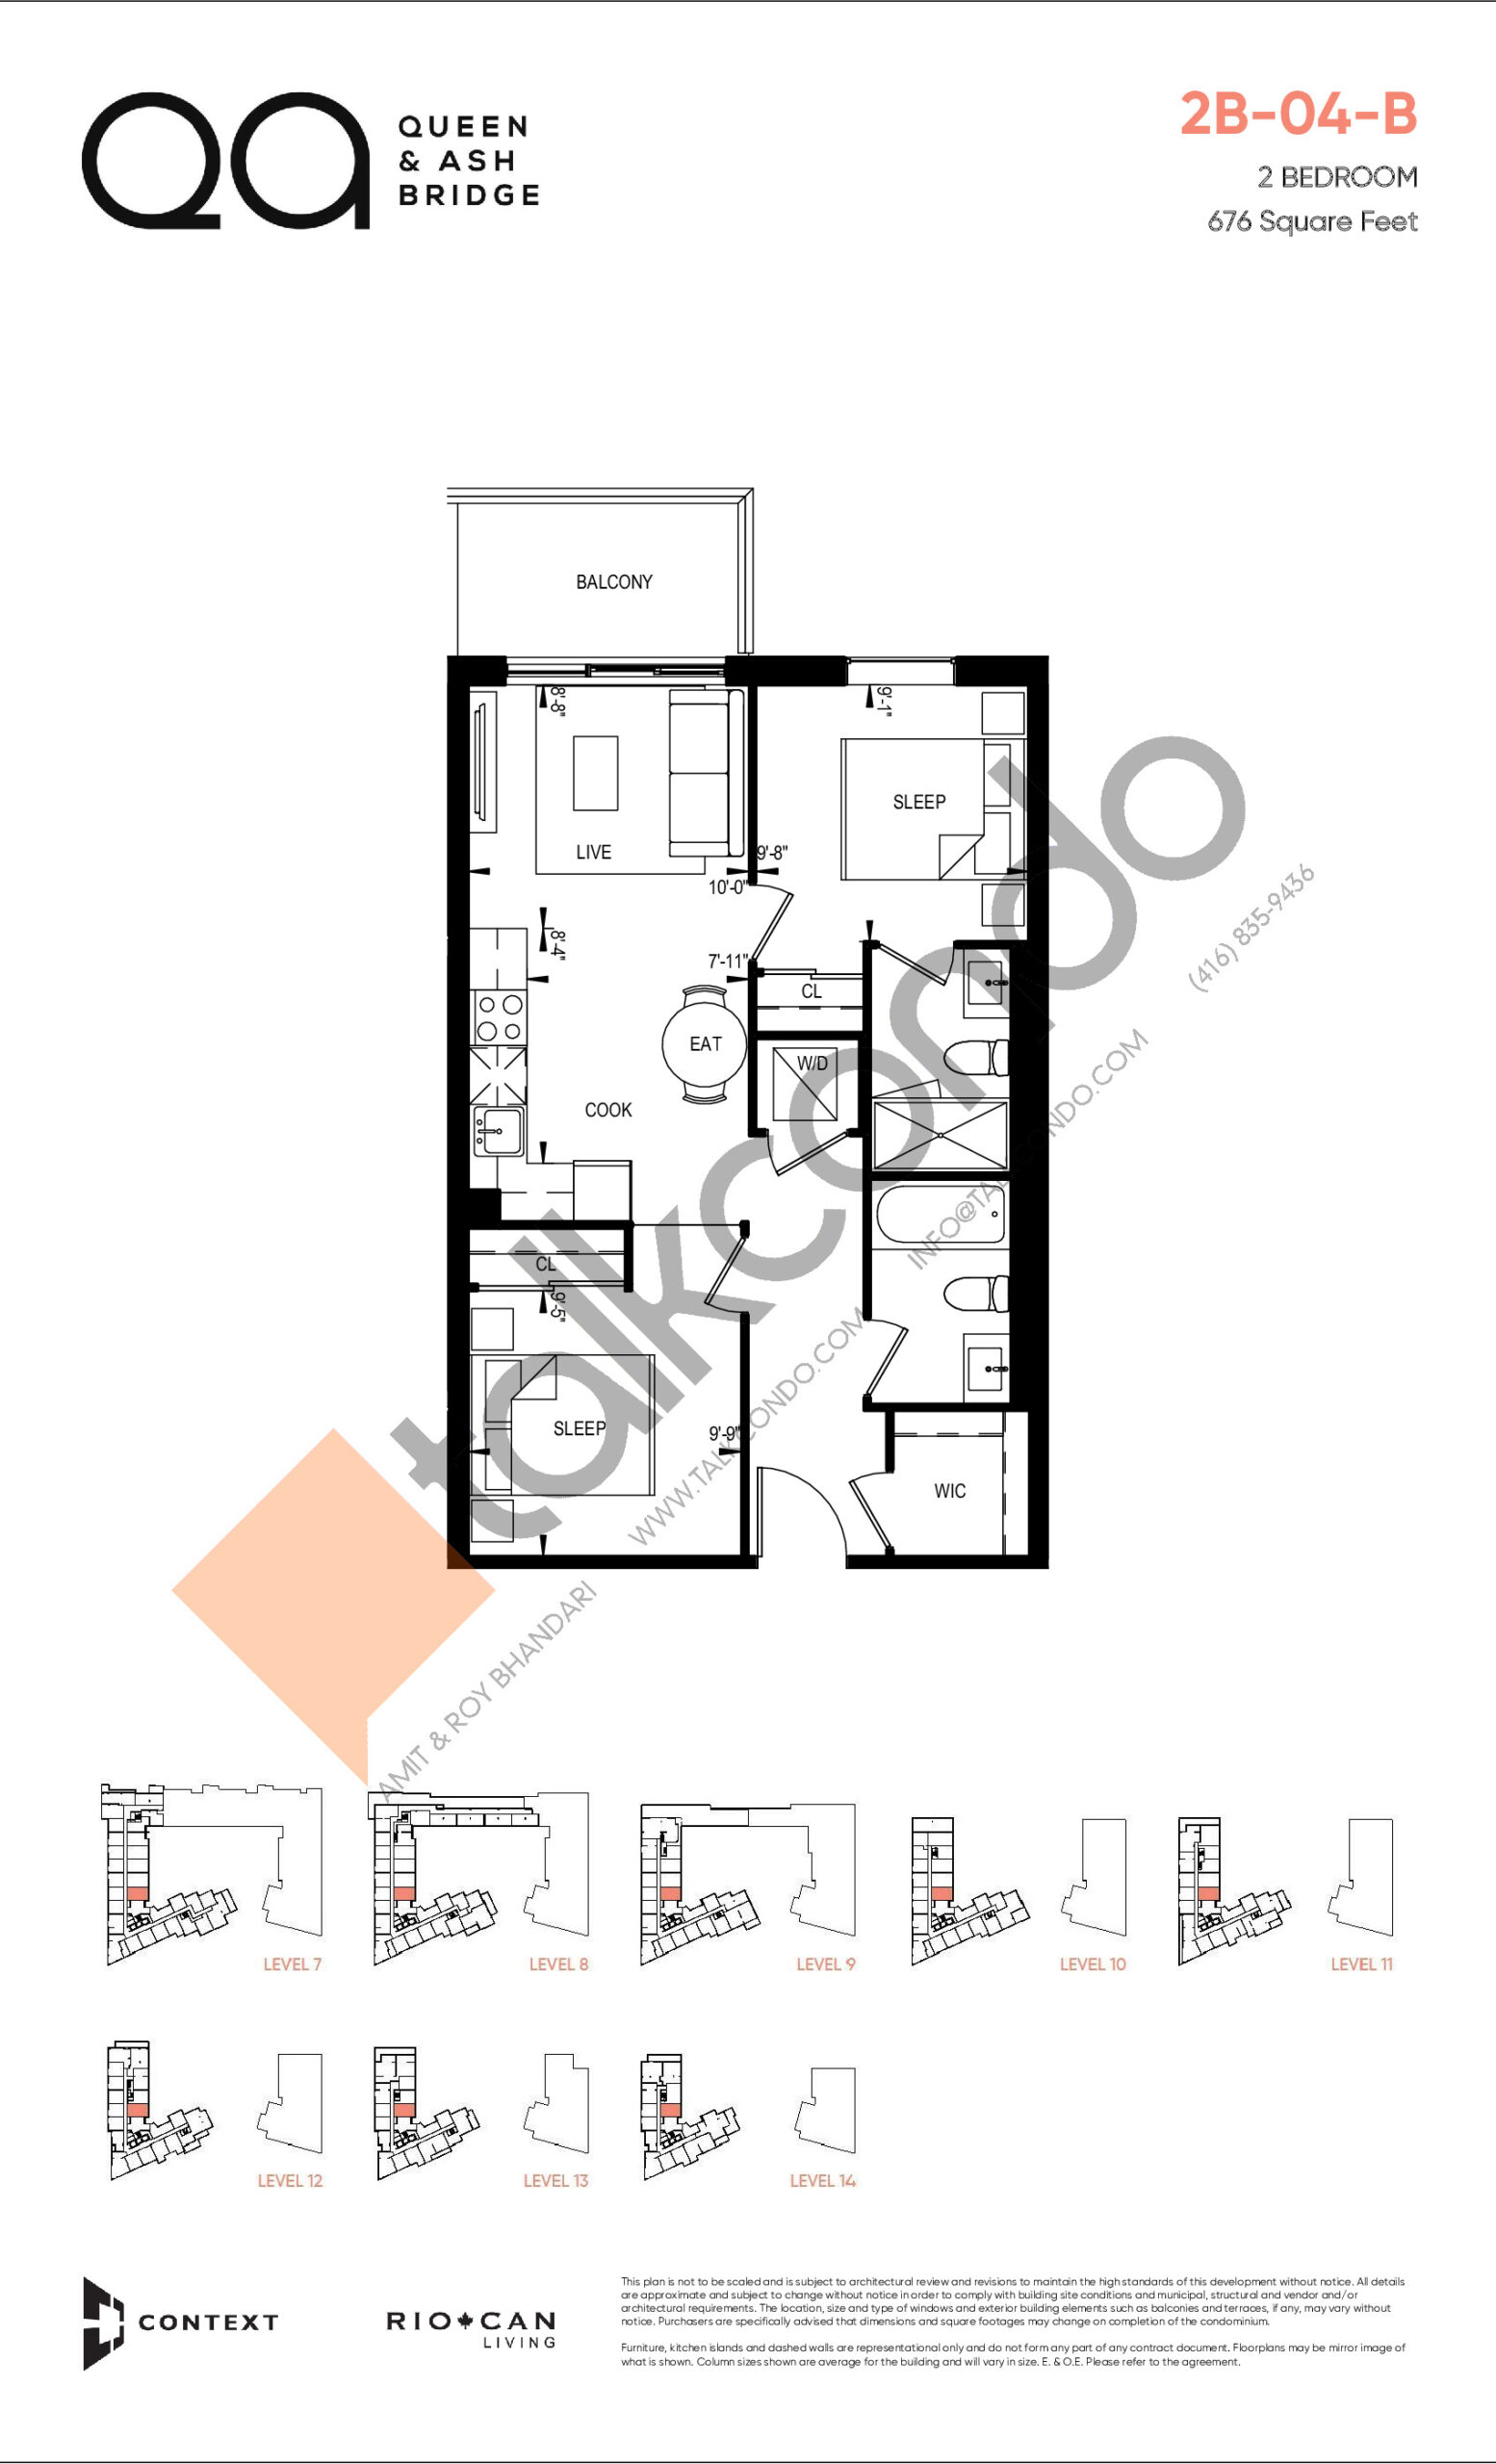 2B-04-B (Queen Collection) Floor Plan at QA Condos - 676 sq.ft